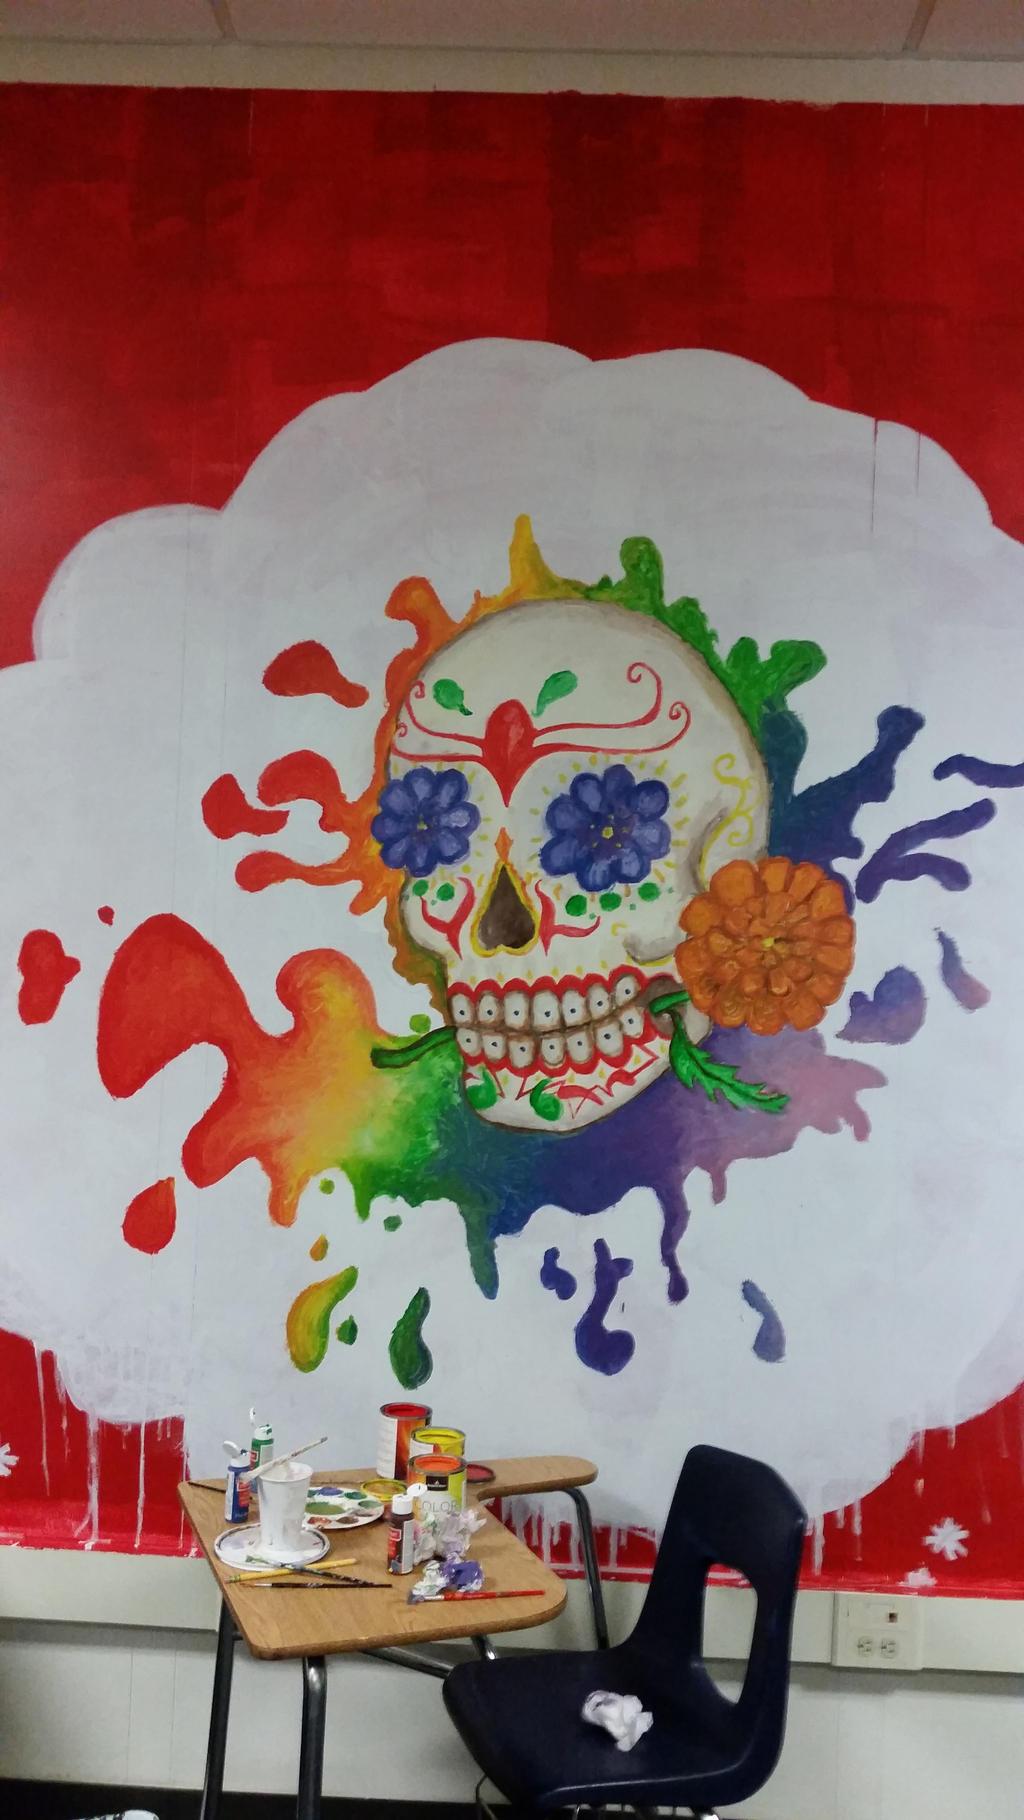 Dia de los muertos mural by makaruwolf55218 on deviantart for Dia mural artist